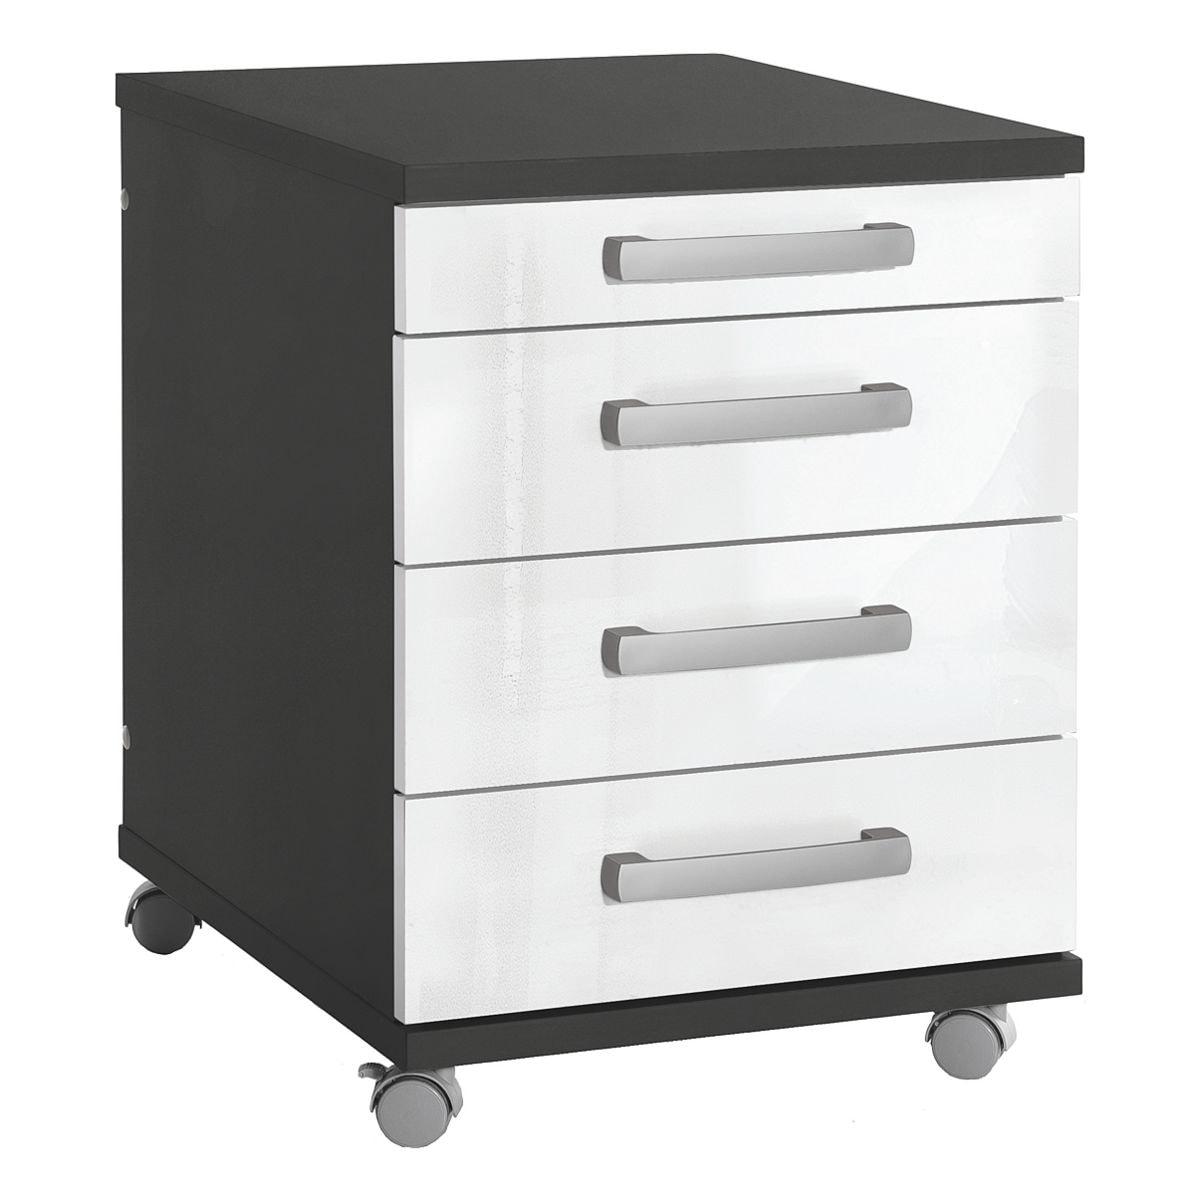 rollcontainer riga bei otto office g nstig kaufen. Black Bedroom Furniture Sets. Home Design Ideas